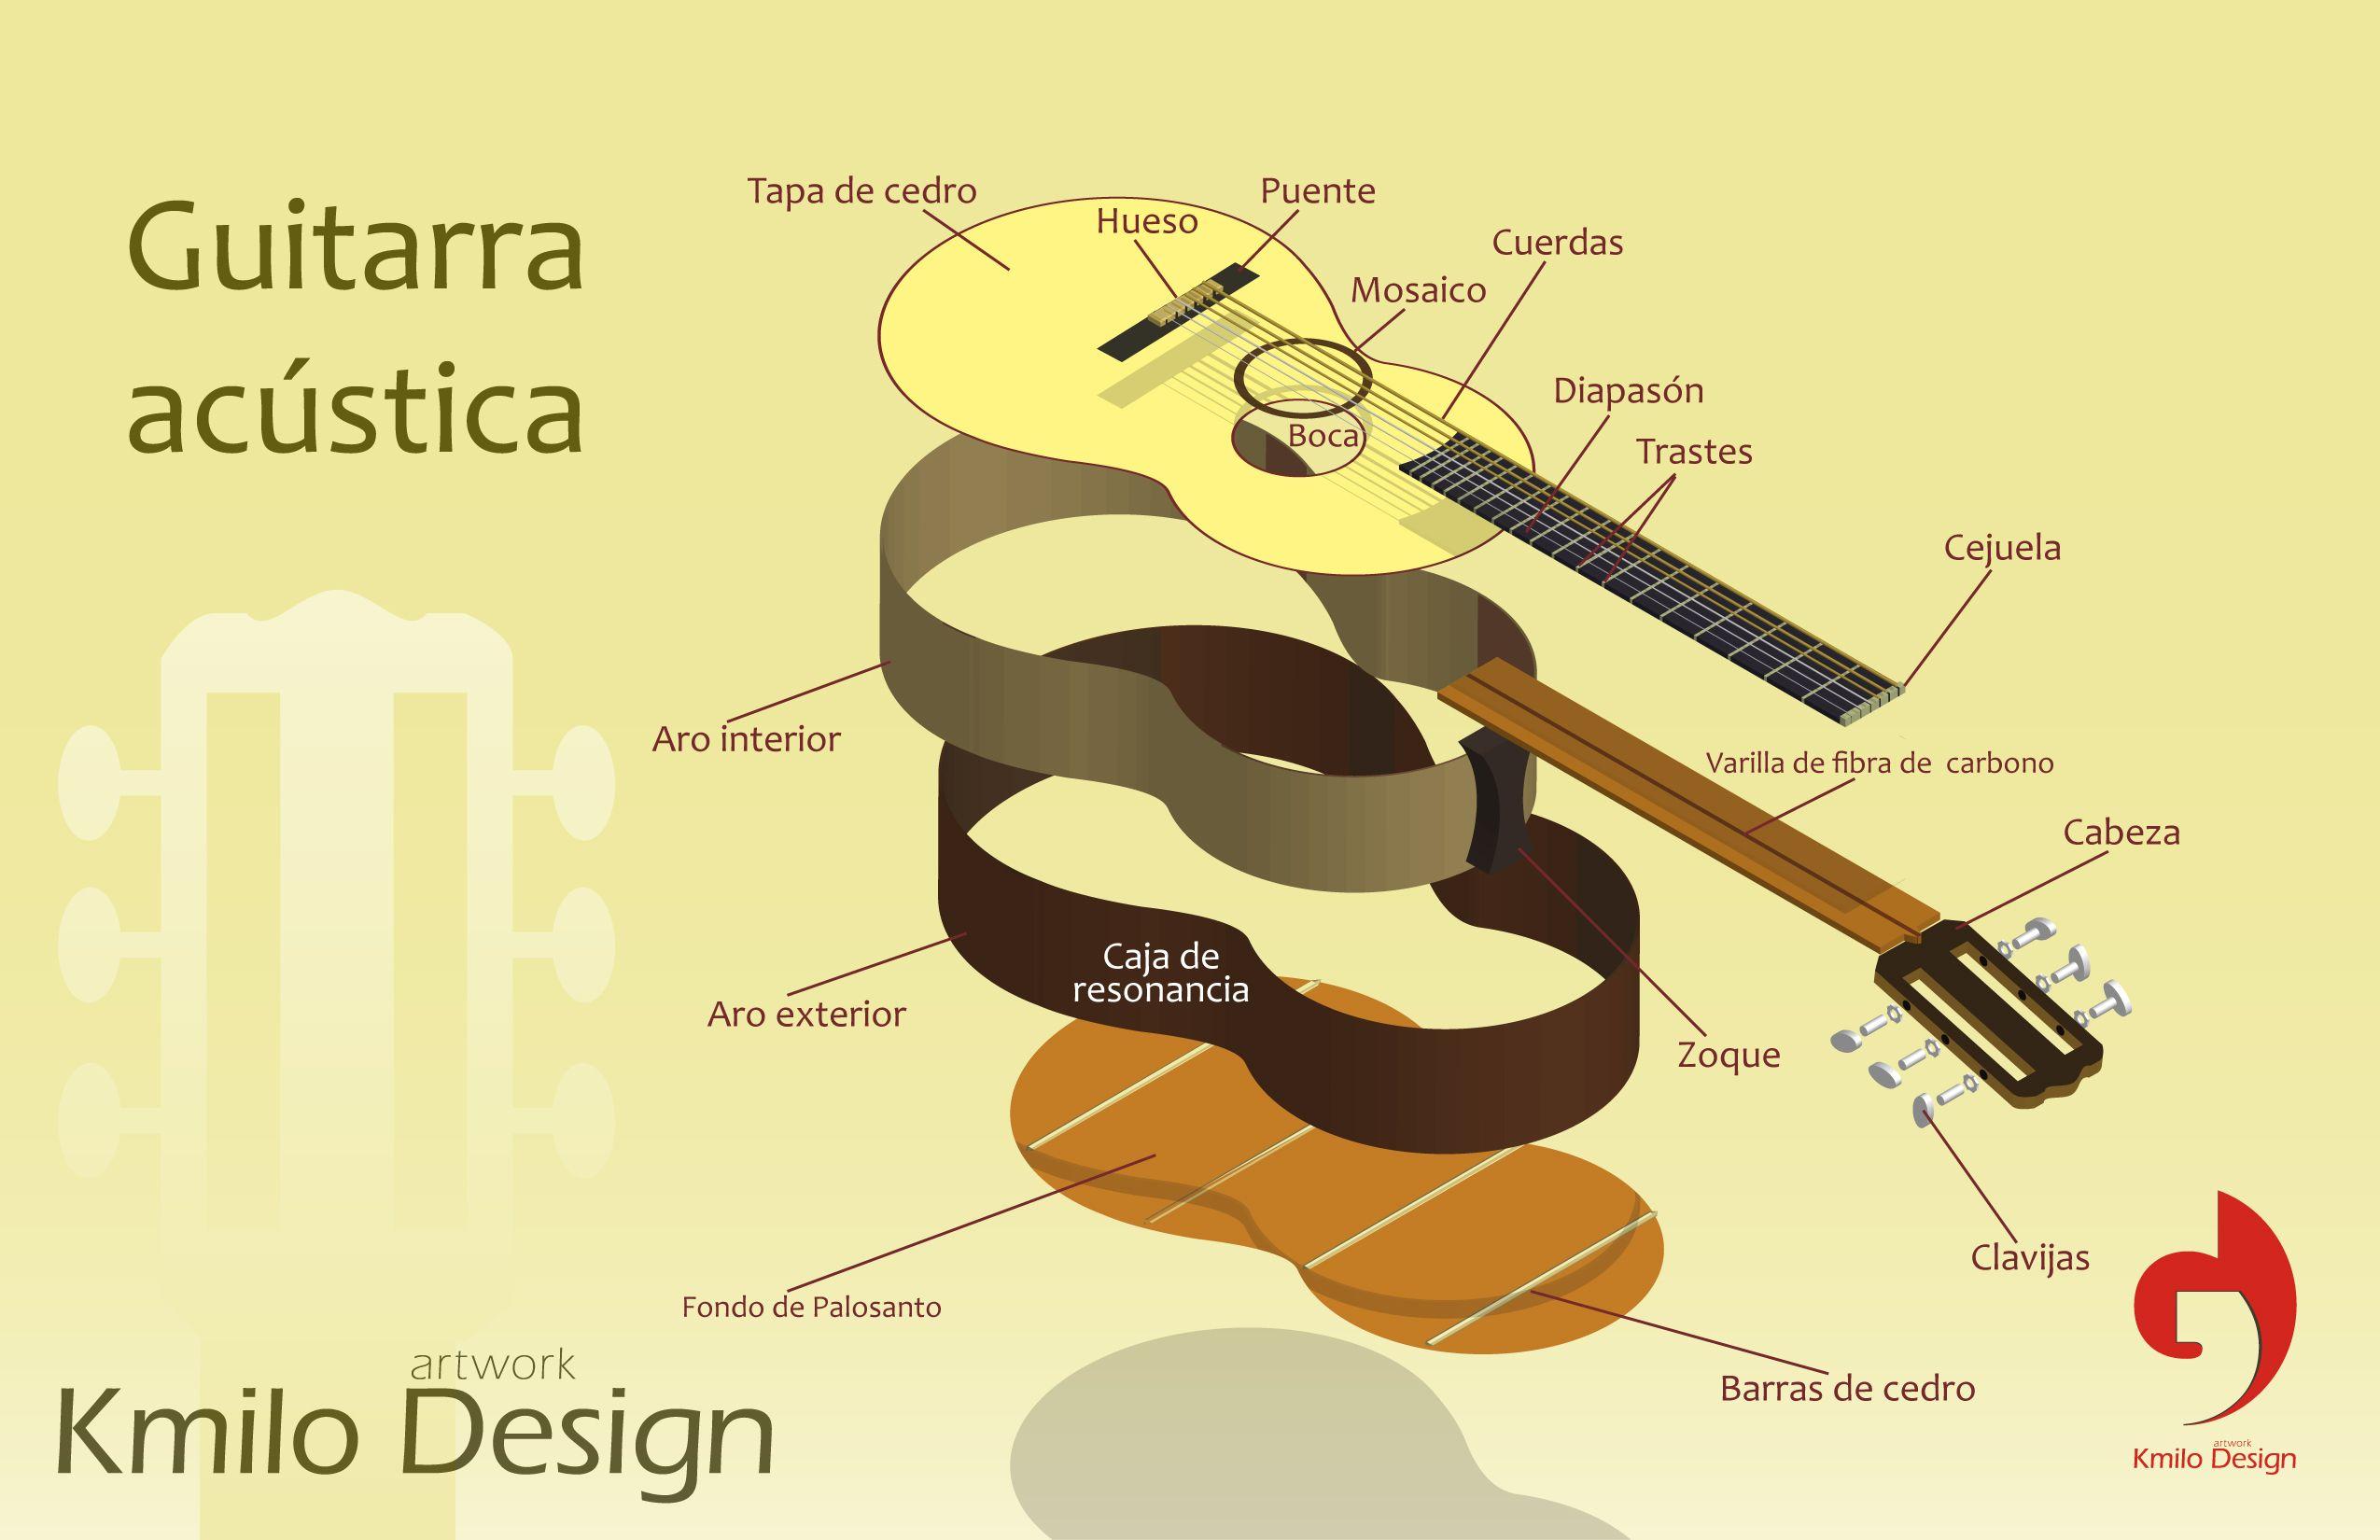 Gráfico de explosión/Guitarra acústica ilustración Vectorial otsirc7@gmail.com